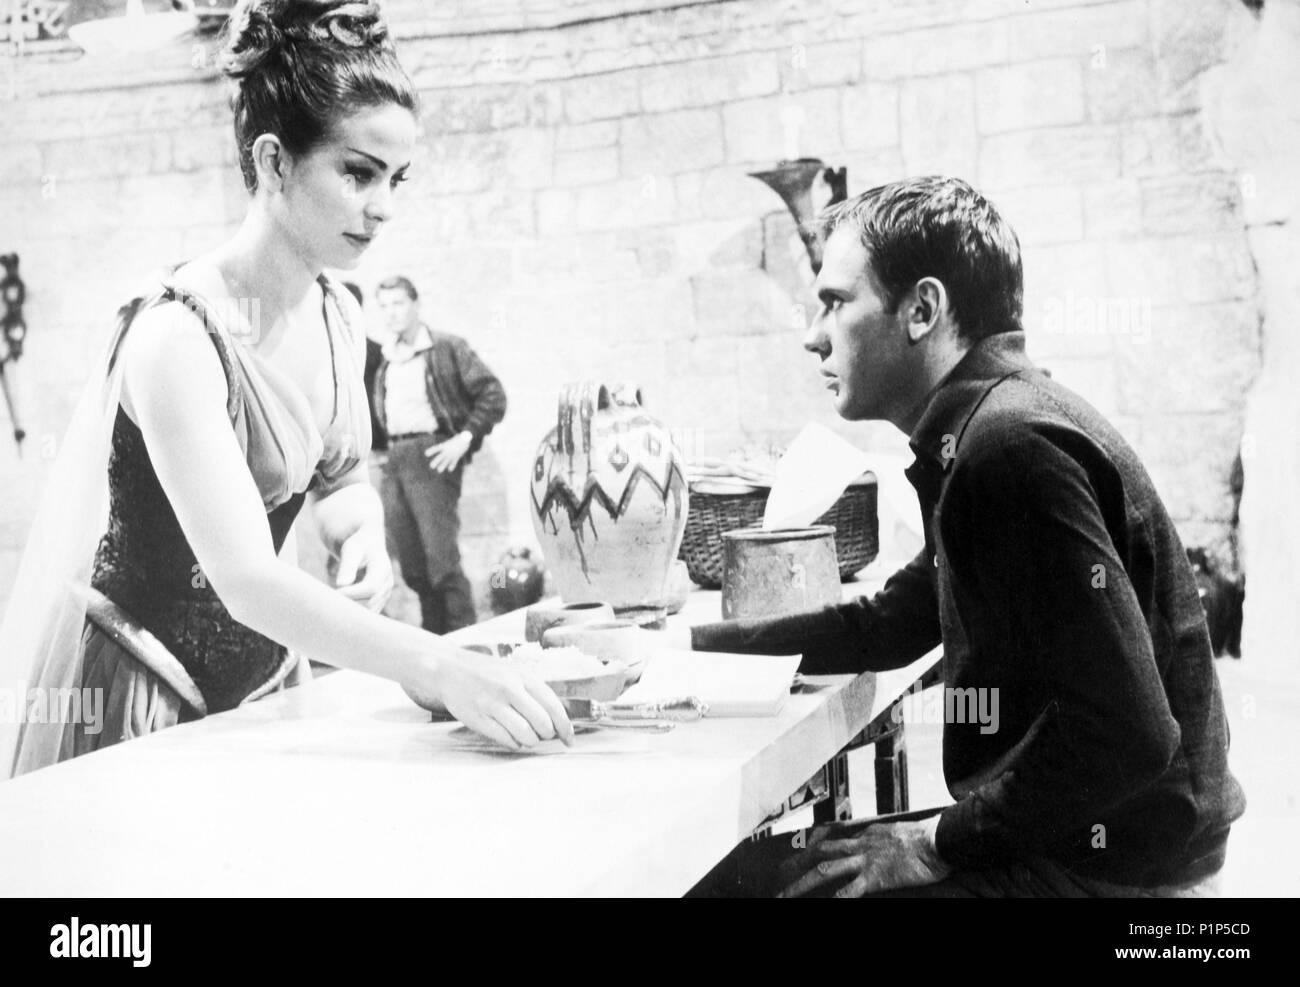 Original Film Title: L' ATLANTIDE.  English Title: ATLANTIS, CITY BENEATH THE DESERT.  Film Director: EDGAR ULMER.  Year: 1961.  Stars: JEAN-LOUIS TRINTIGNANT; HAYA HARAREET. Credit: TITANUS / Album - Stock Image